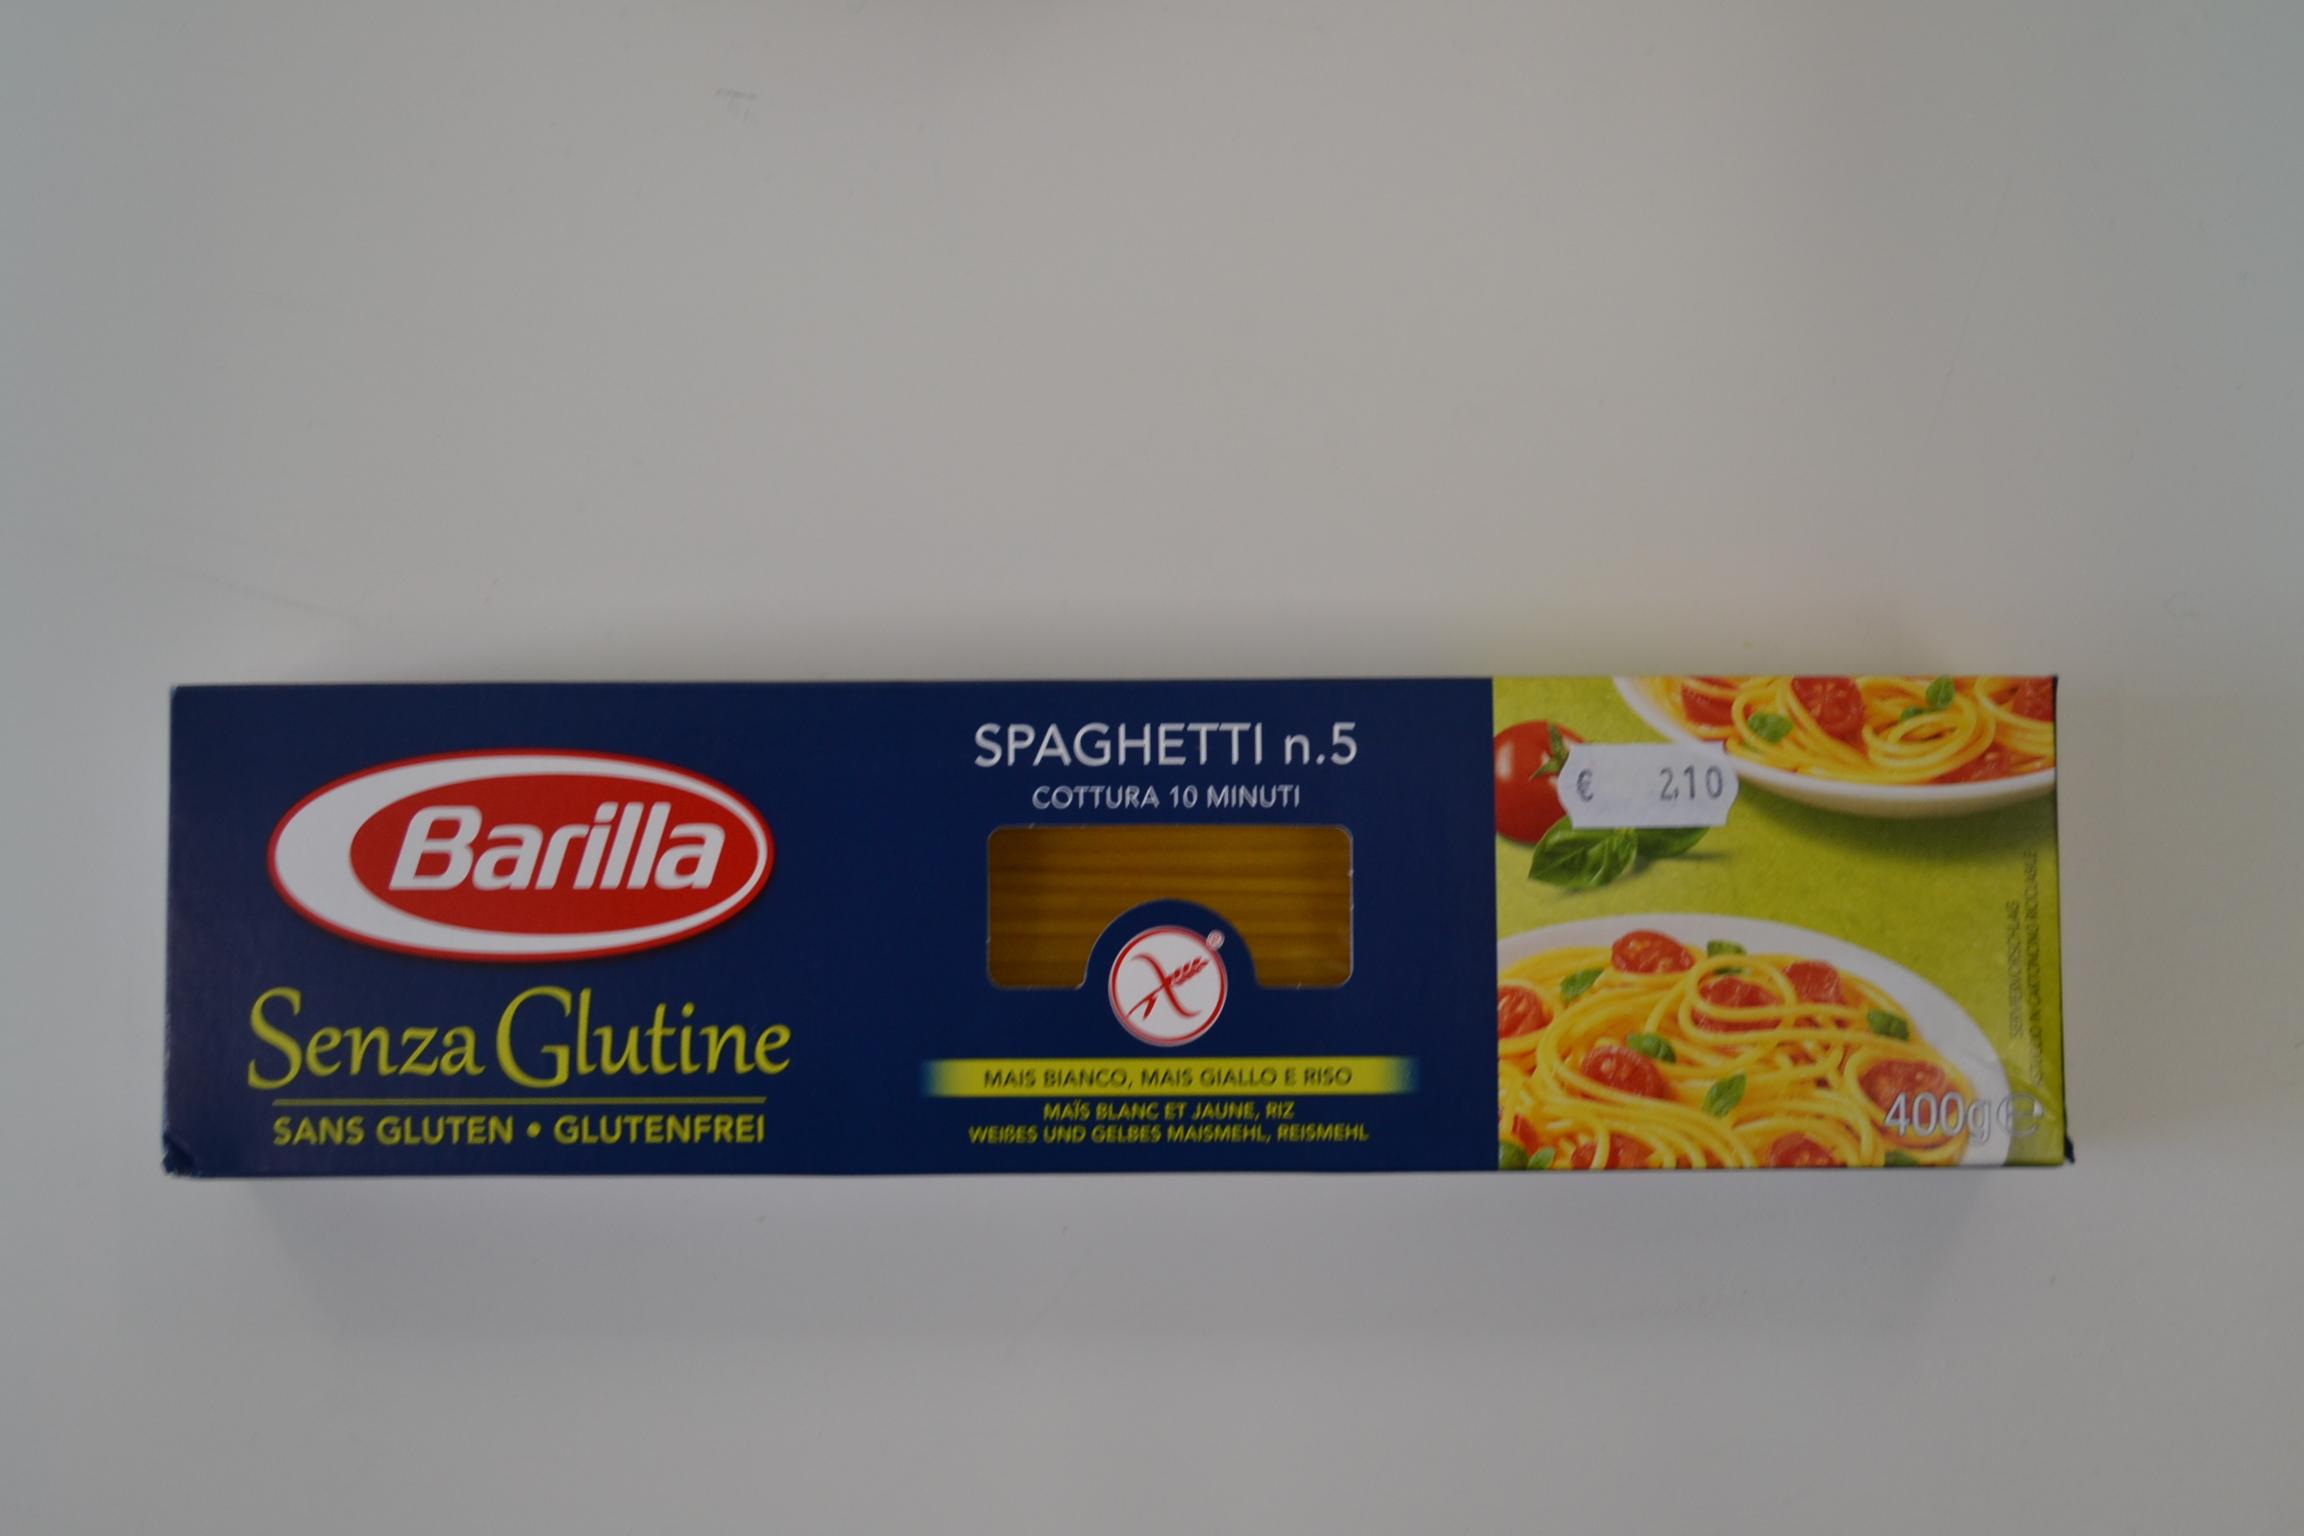 Spaghetti n5 BARILLA € 2,10